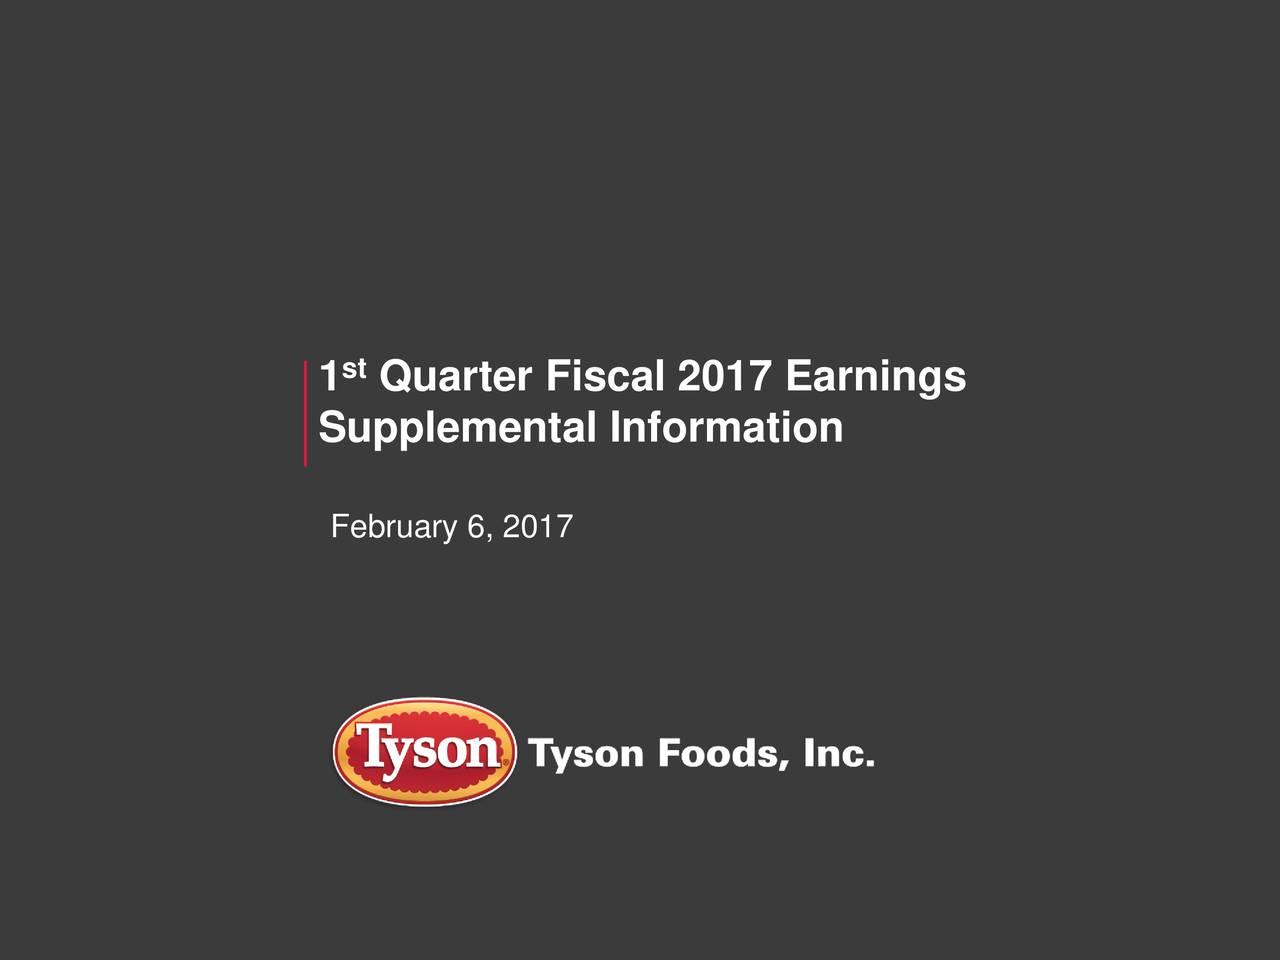 1 Quarter Fiscal 2017 Earnings Supplemental Information February 6, 2017